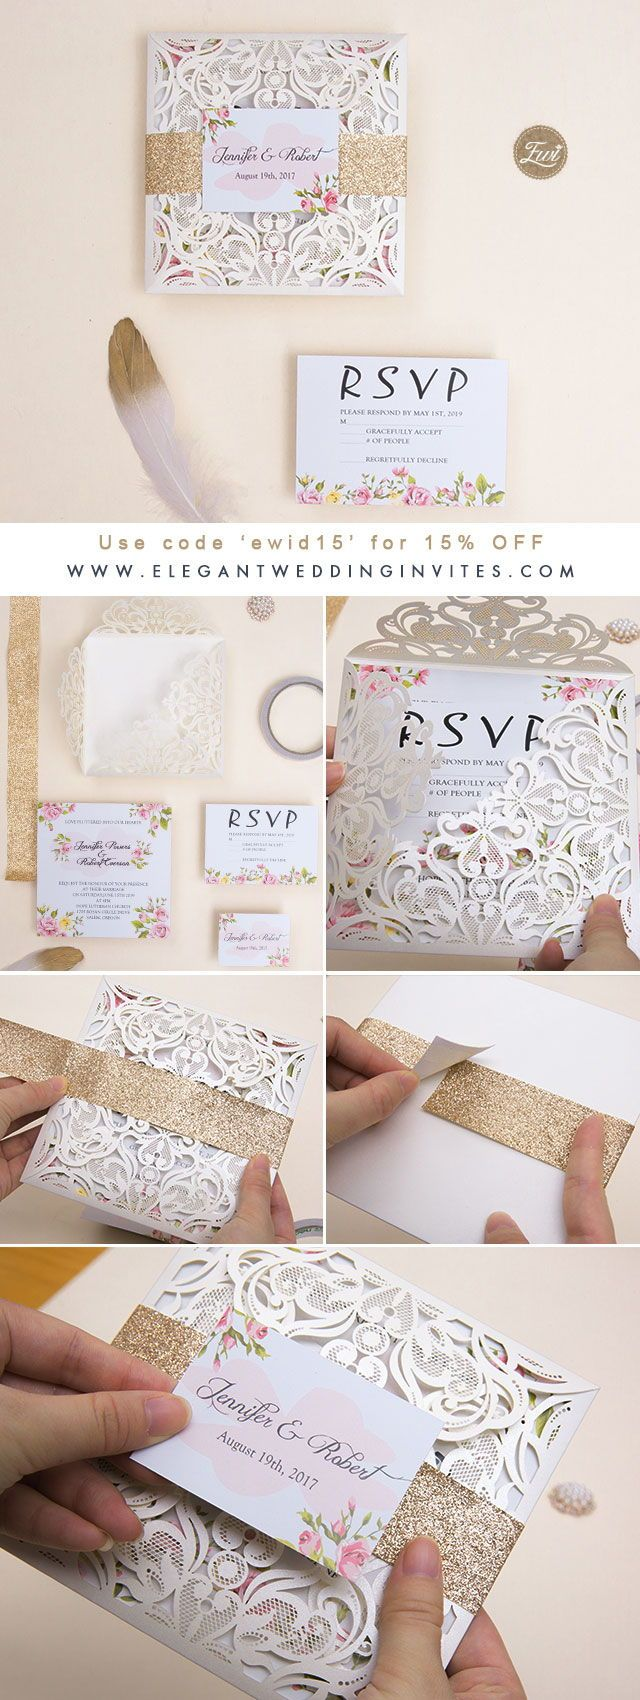 Wedding decorations using pallets october 2018 romantic peach flower spring ivory laser cut wedding invitations